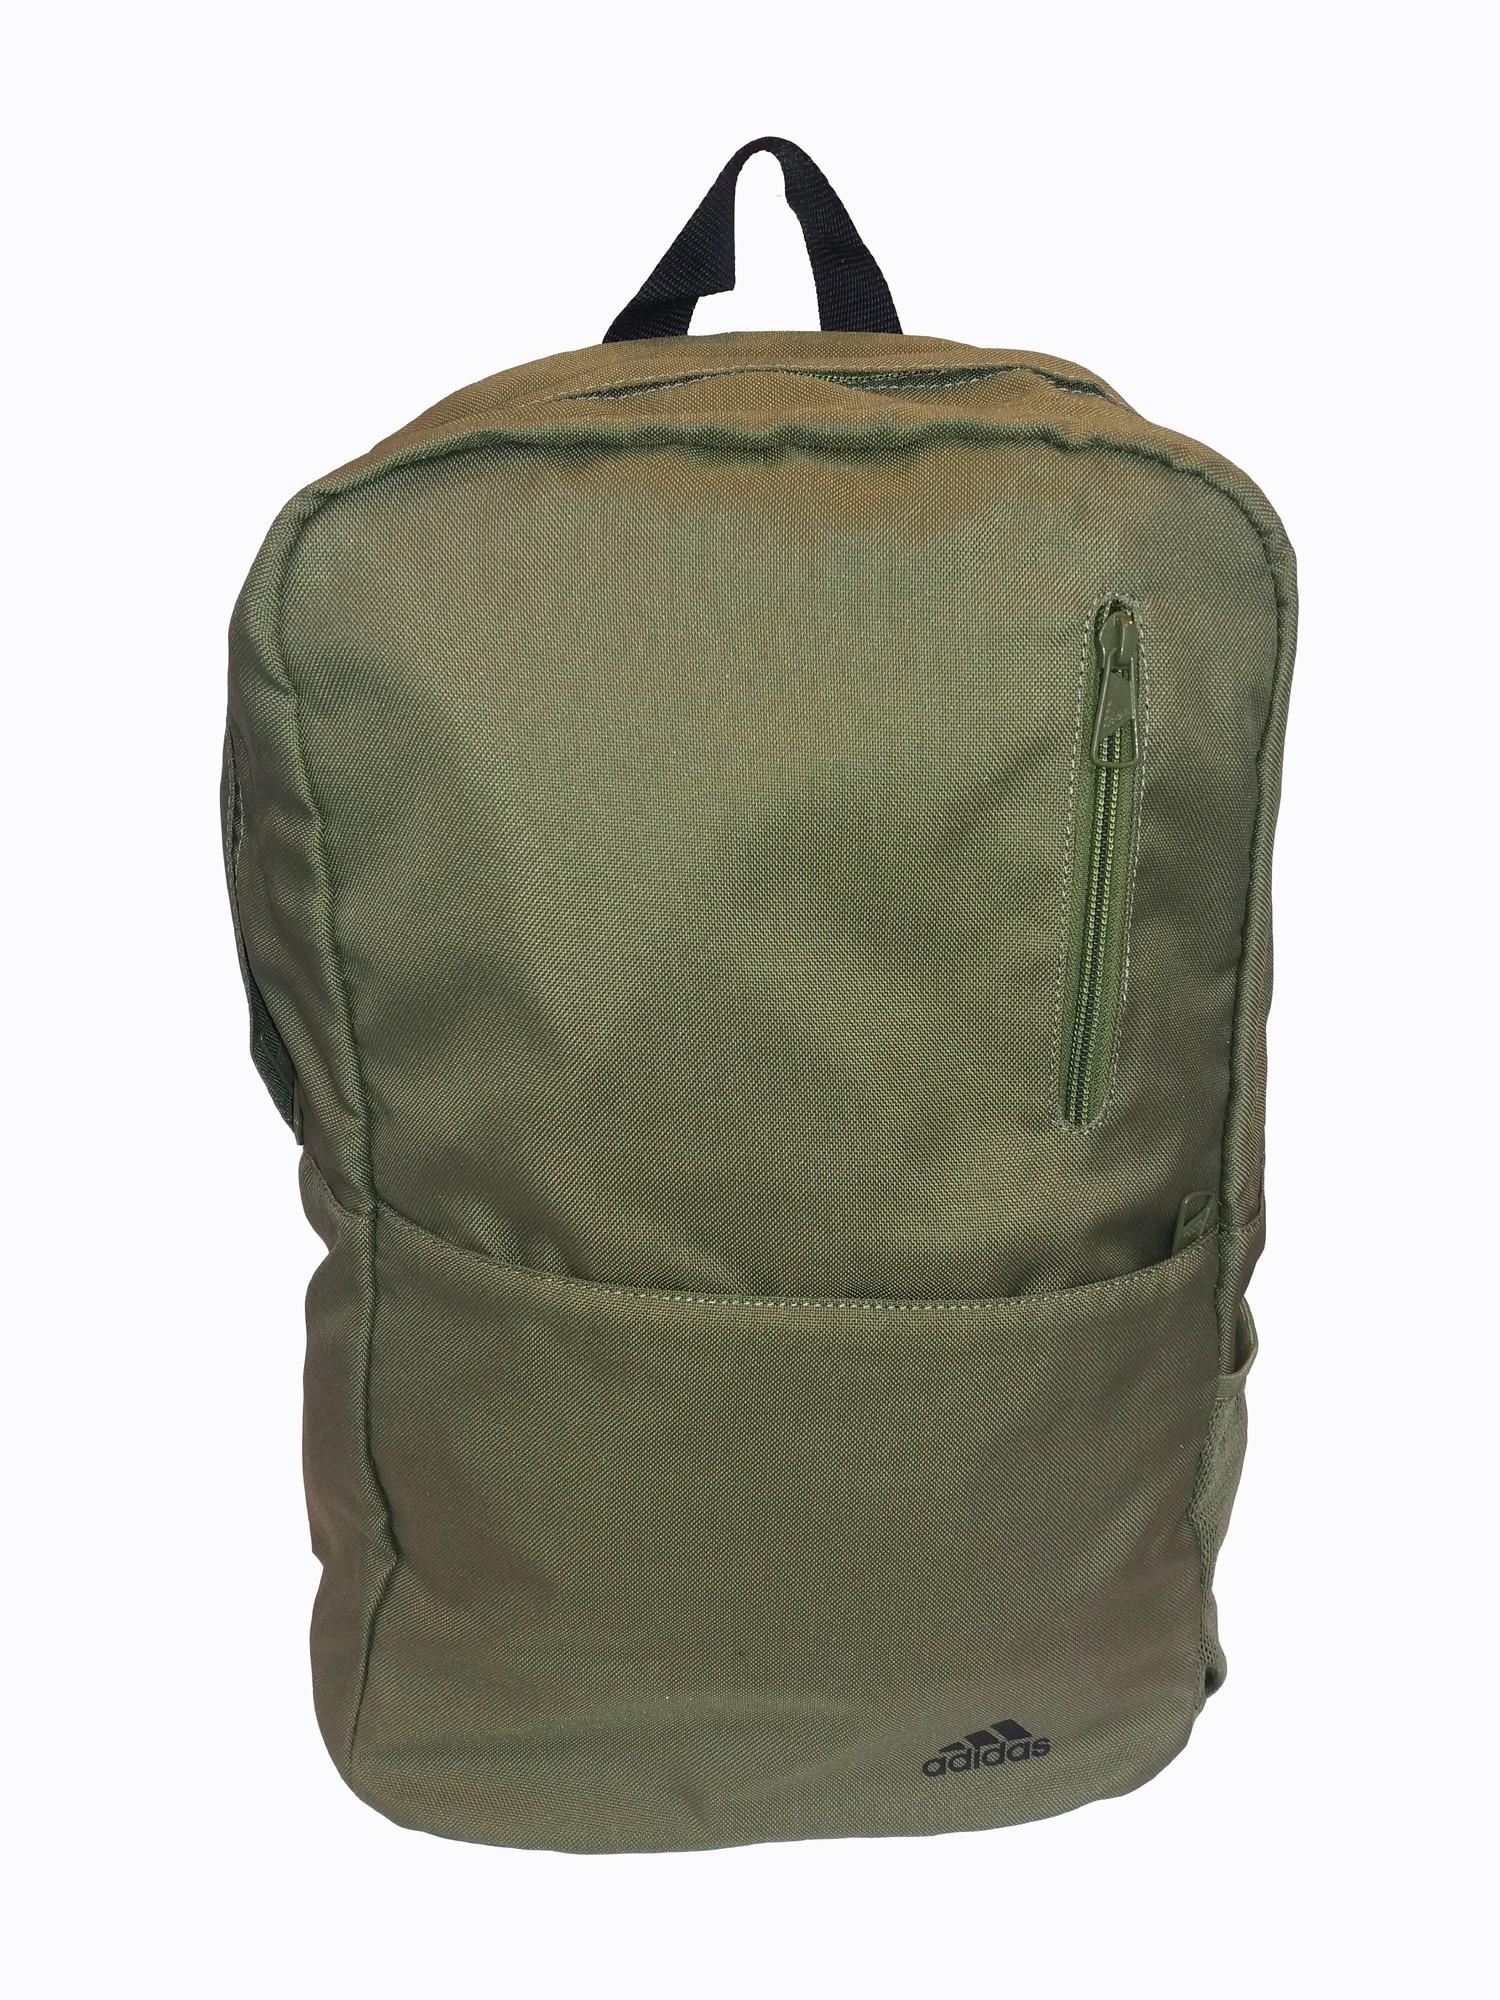 fbb05860db12 Adidas f49827 Unisex Black Versatile 3s Backpack - Best Price in ...